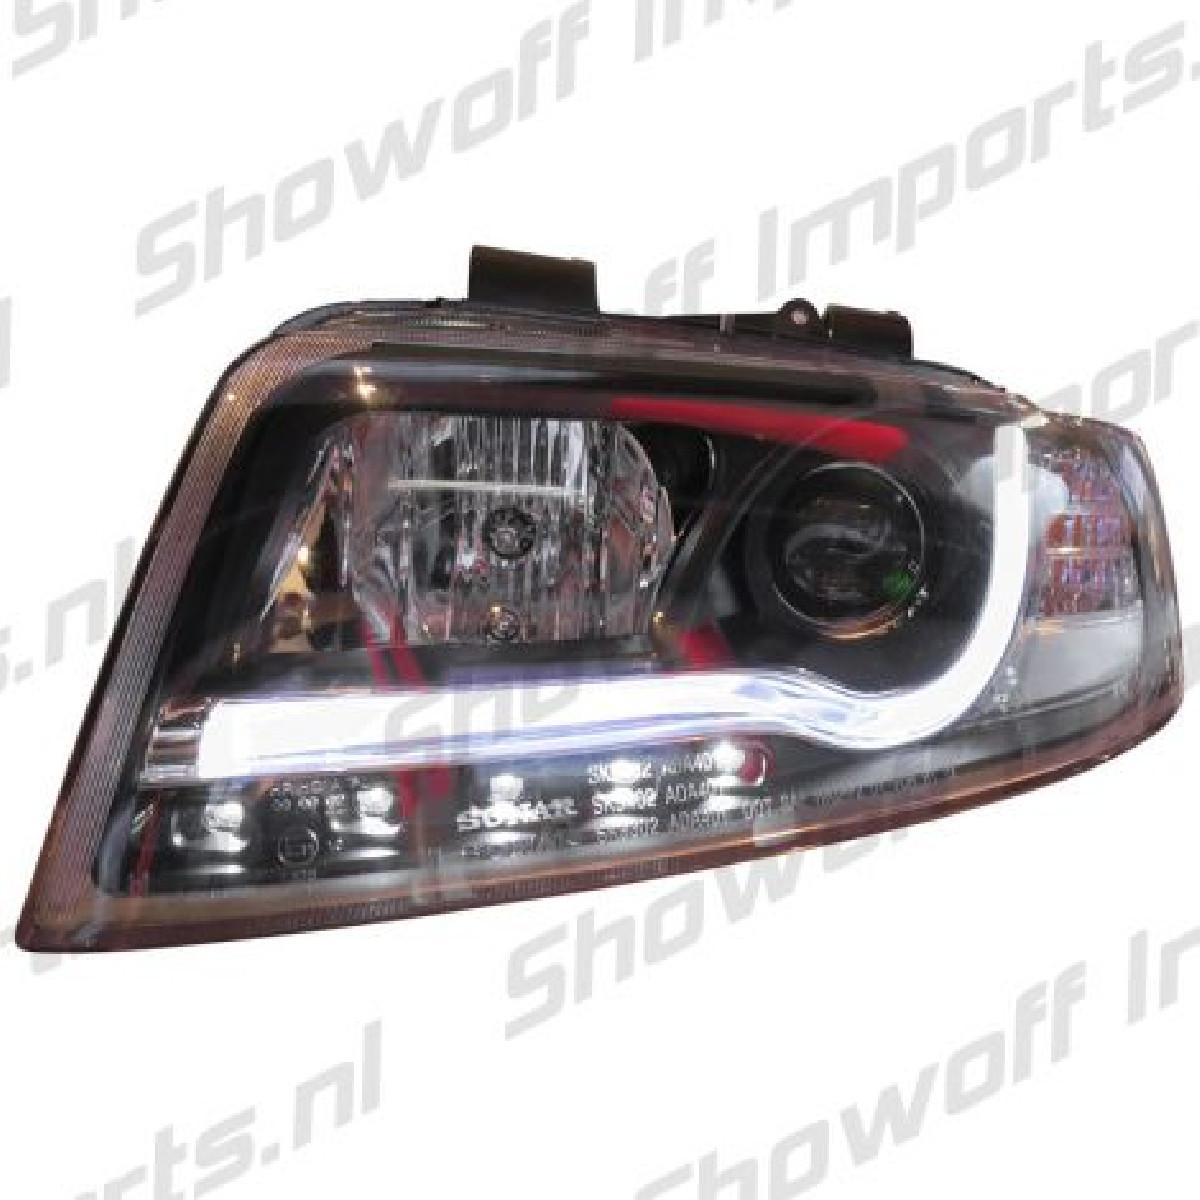 Audi A4 8E 01-04 Headlights Set DRL Clear